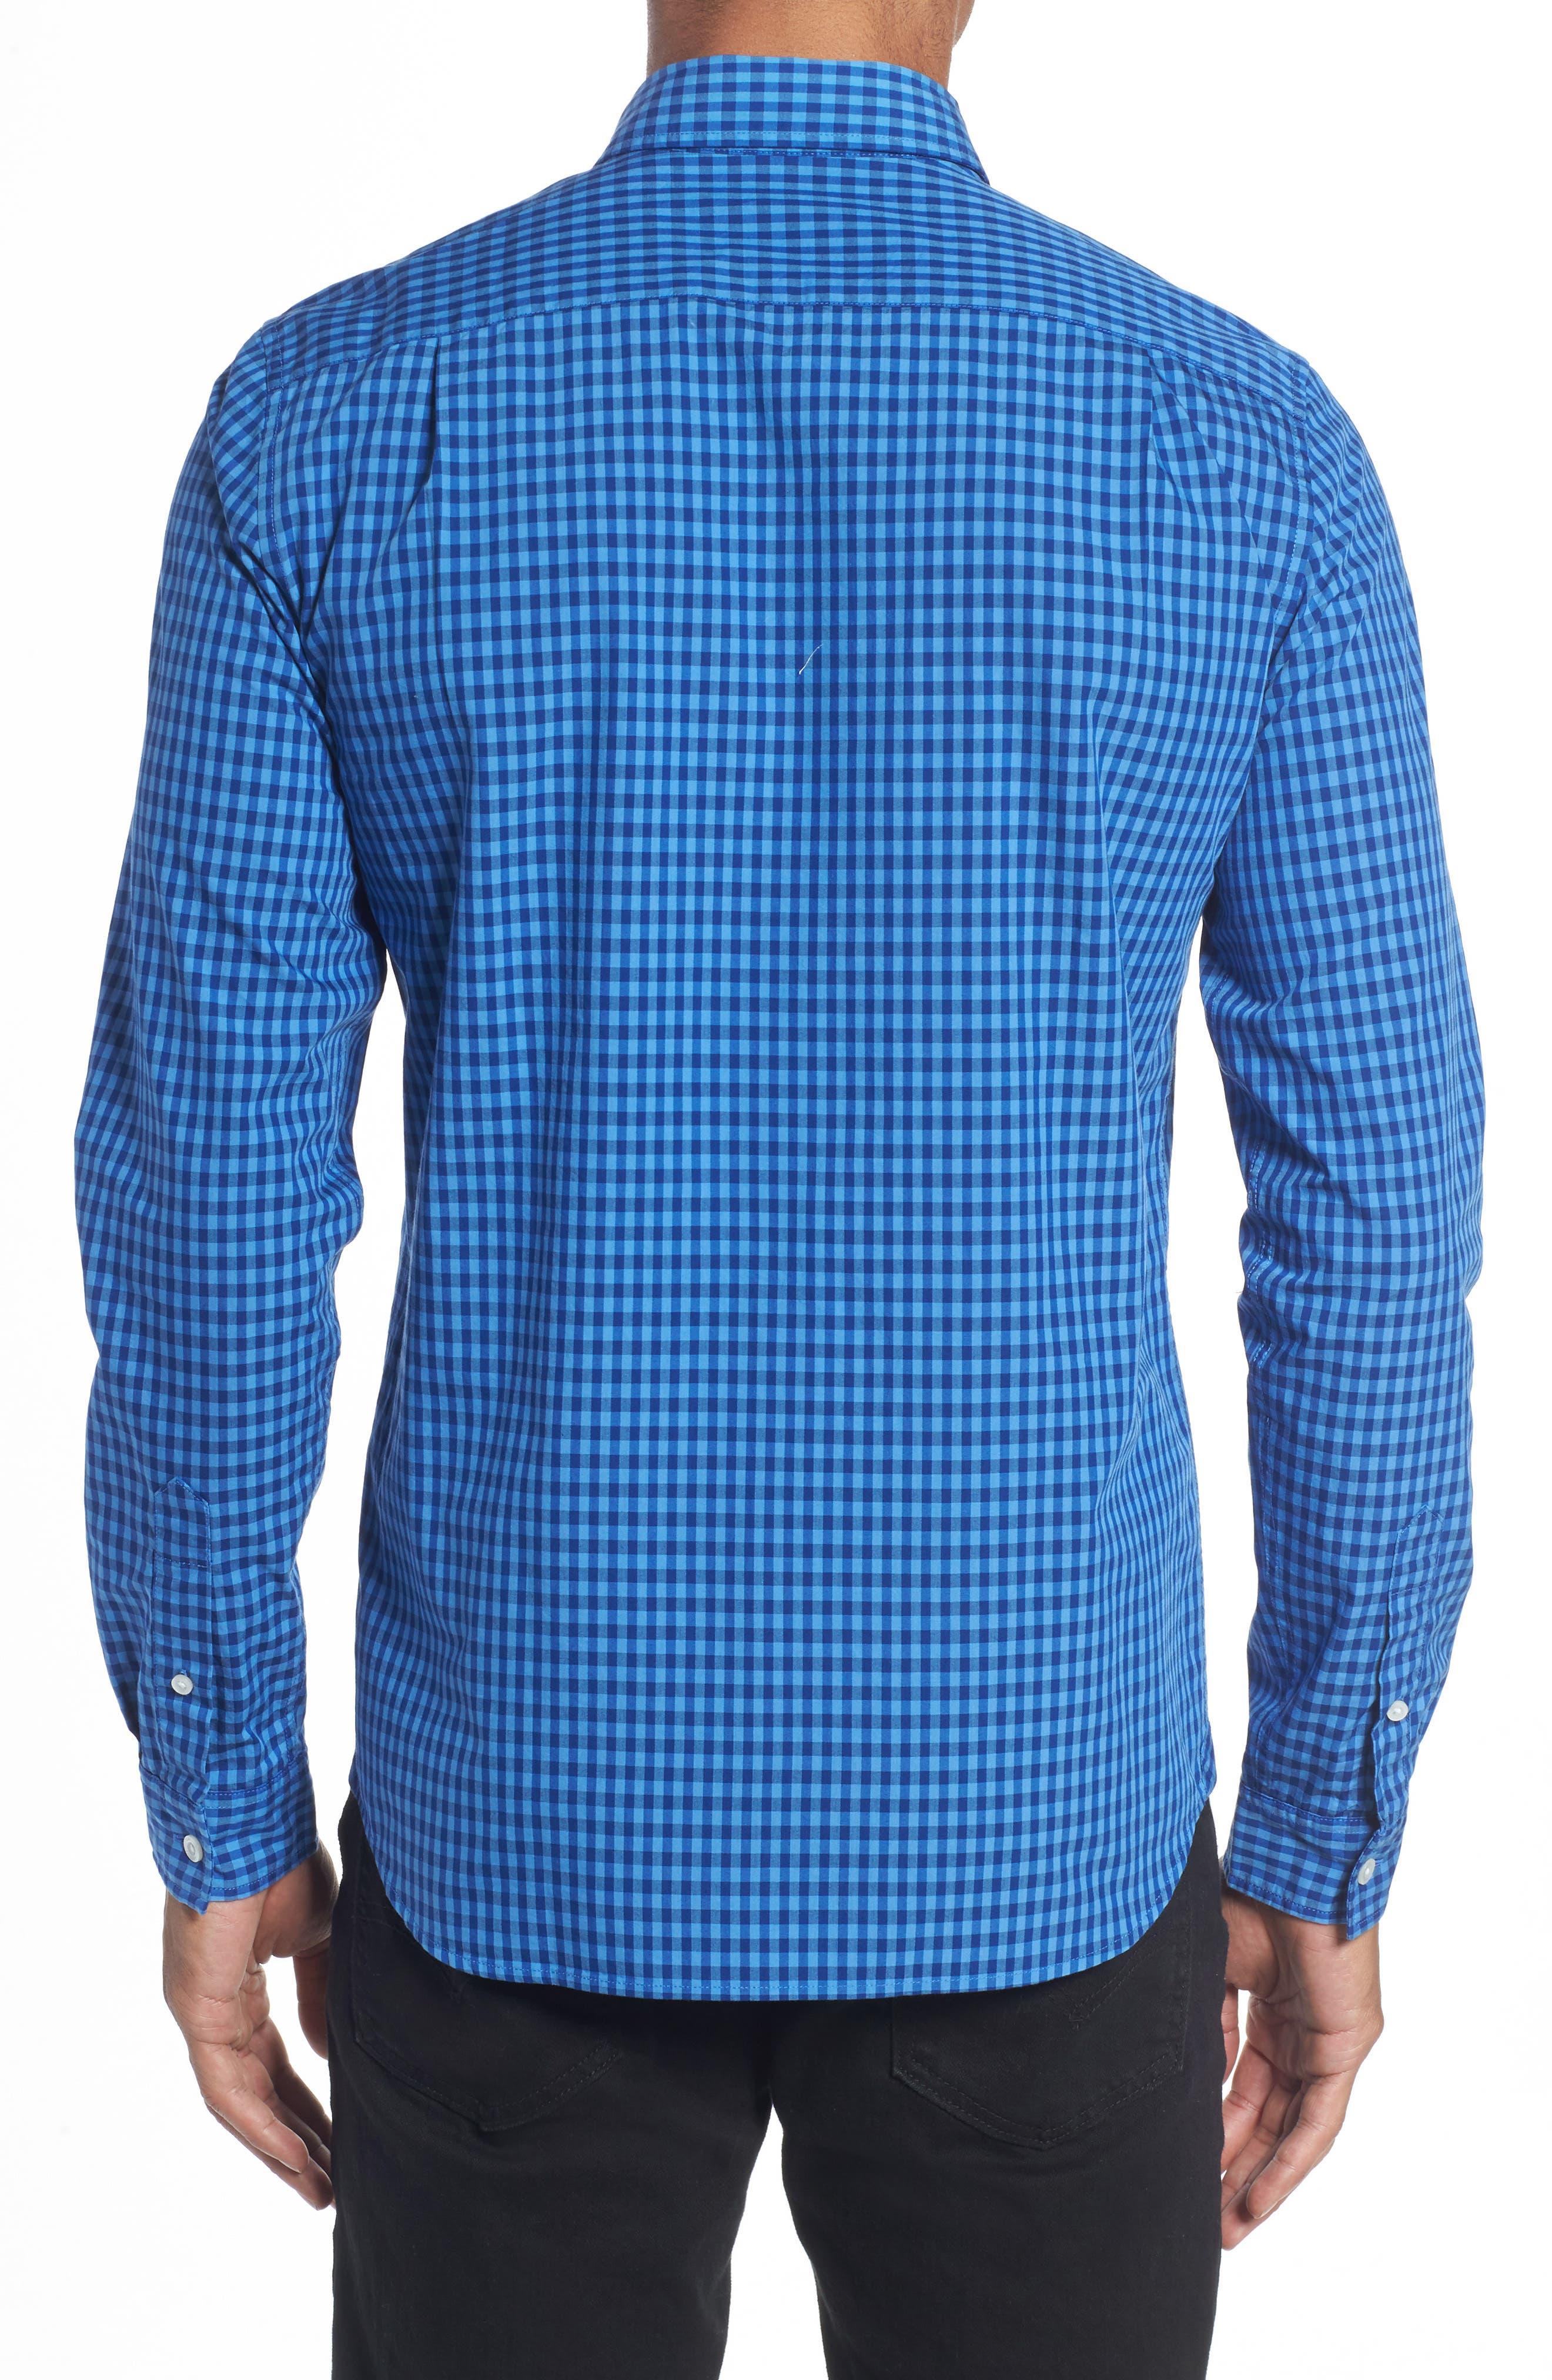 Gingham Check Poplin Shirt,                             Alternate thumbnail 2, color,                             493